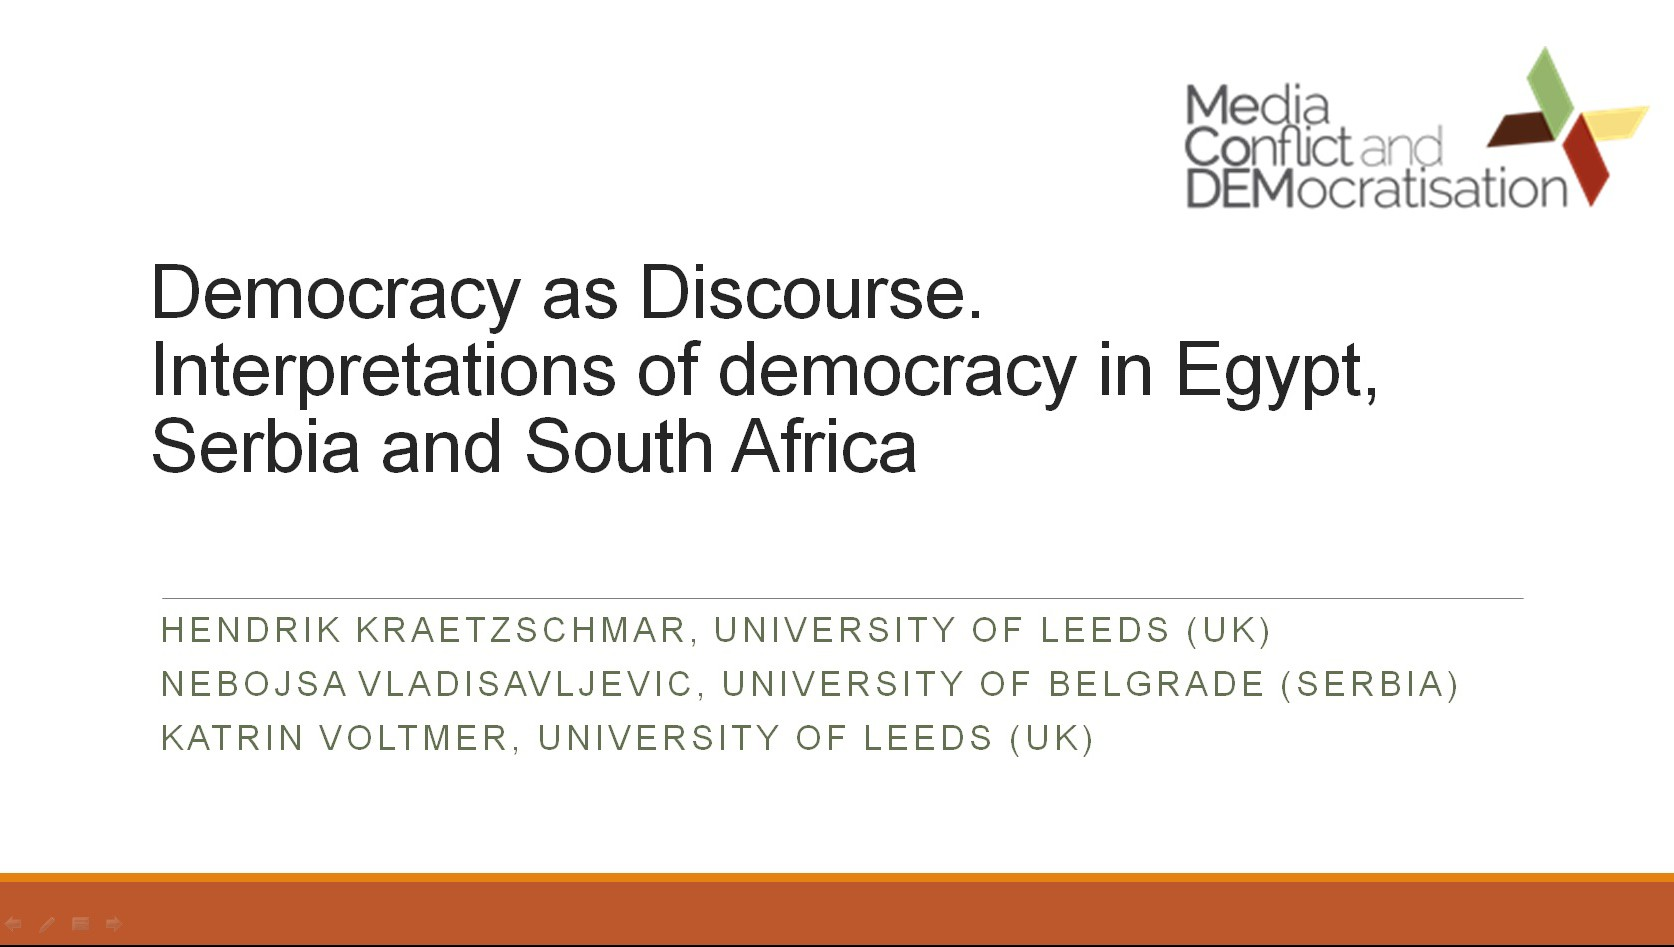 Democracy in Egypt